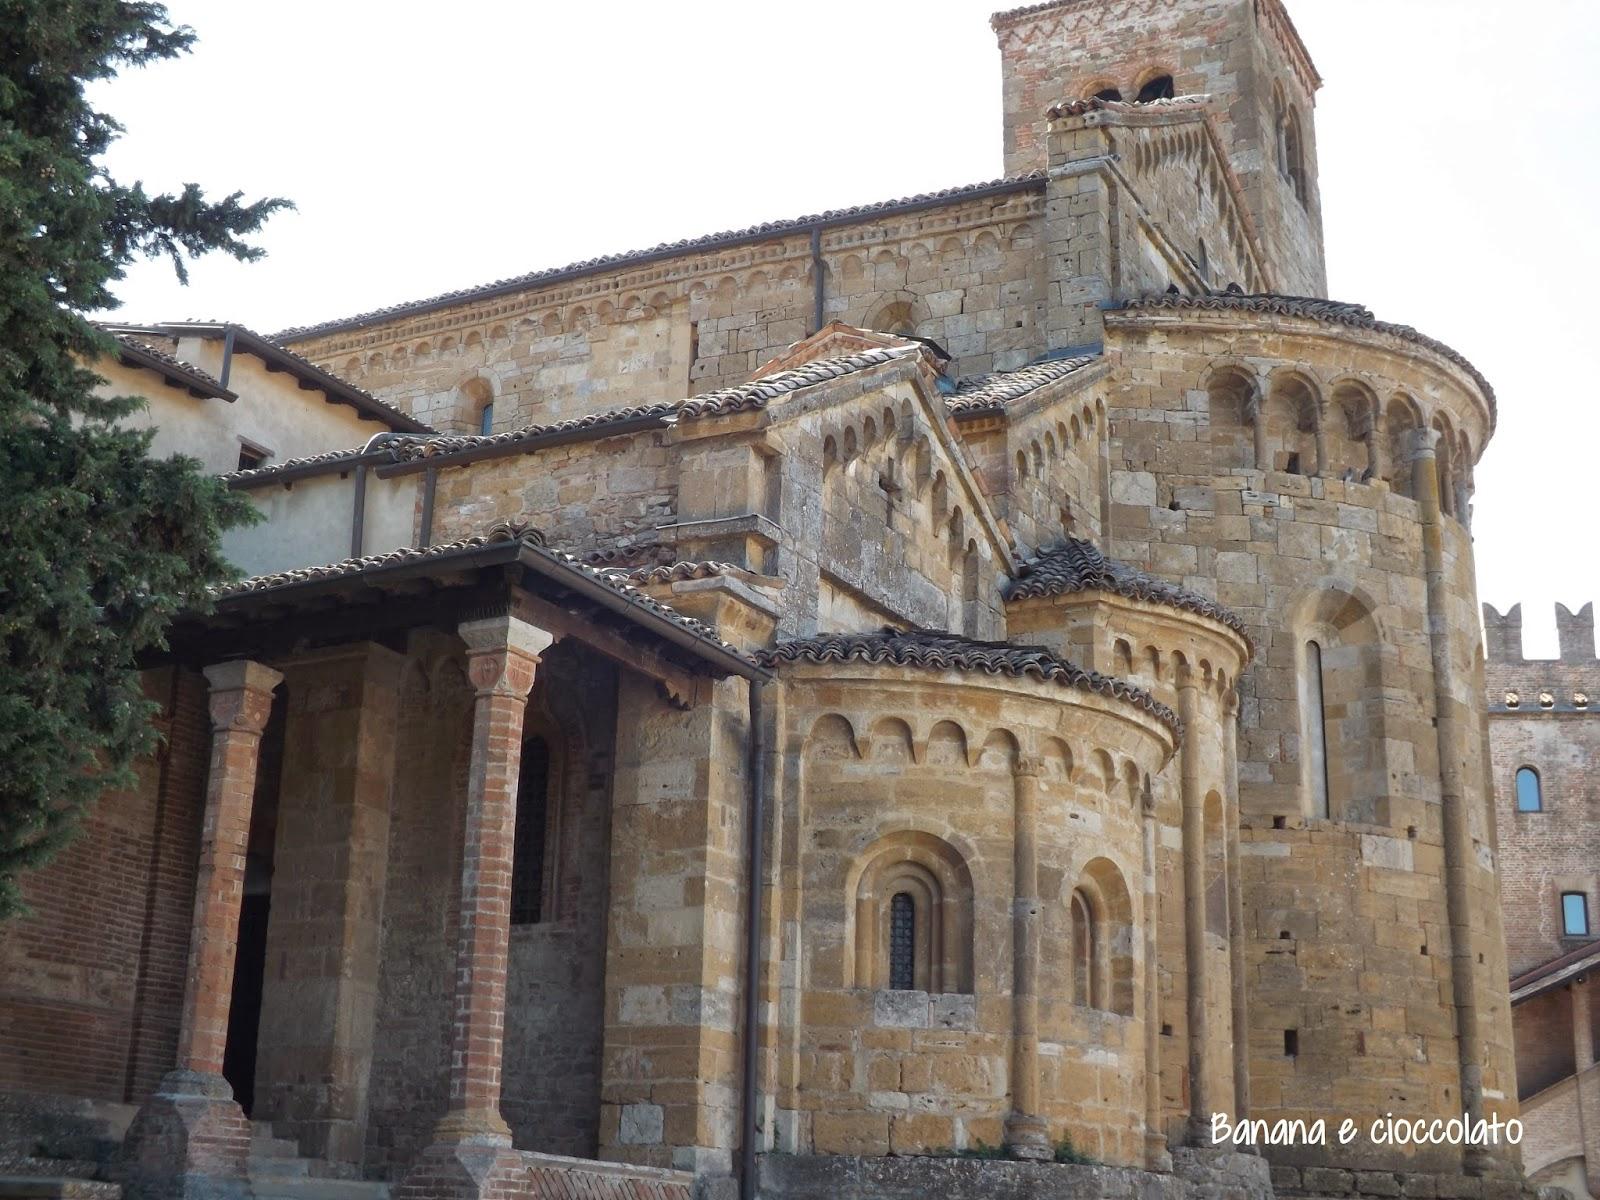 castell'arquato, Piacenza, banana e cioccolato blog